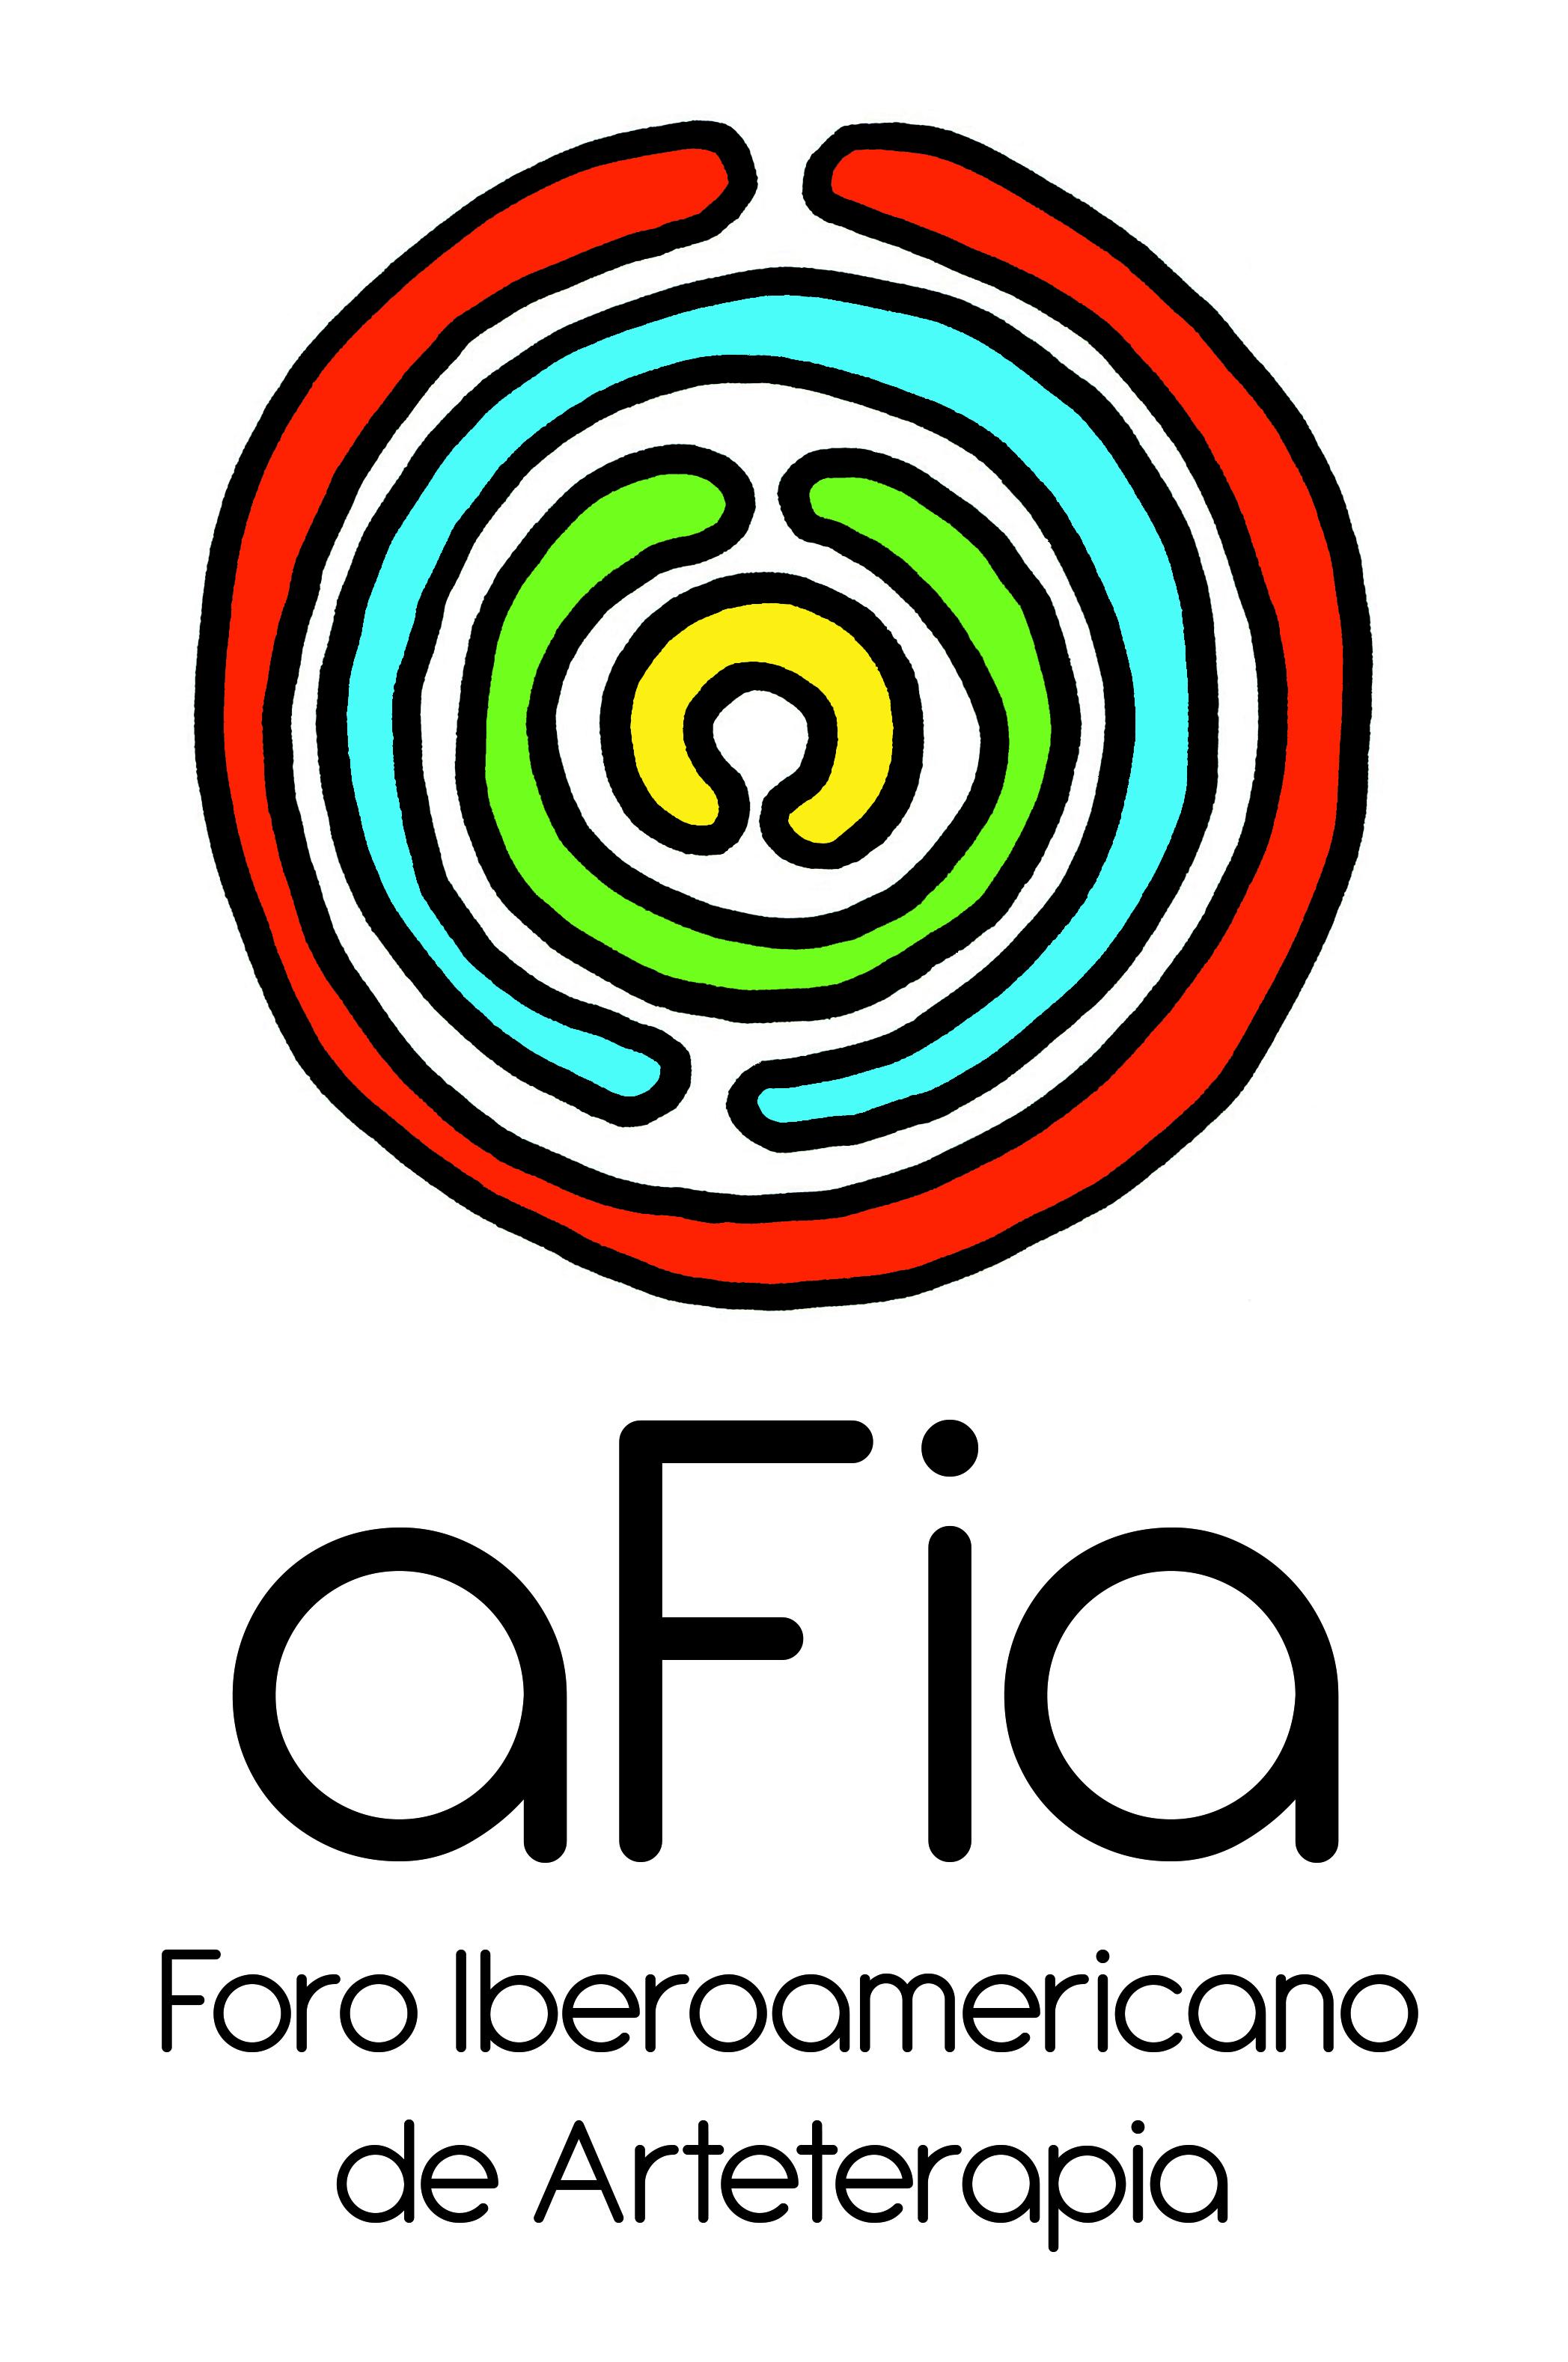 LOGO AFIA 2015 CMYK.JPG